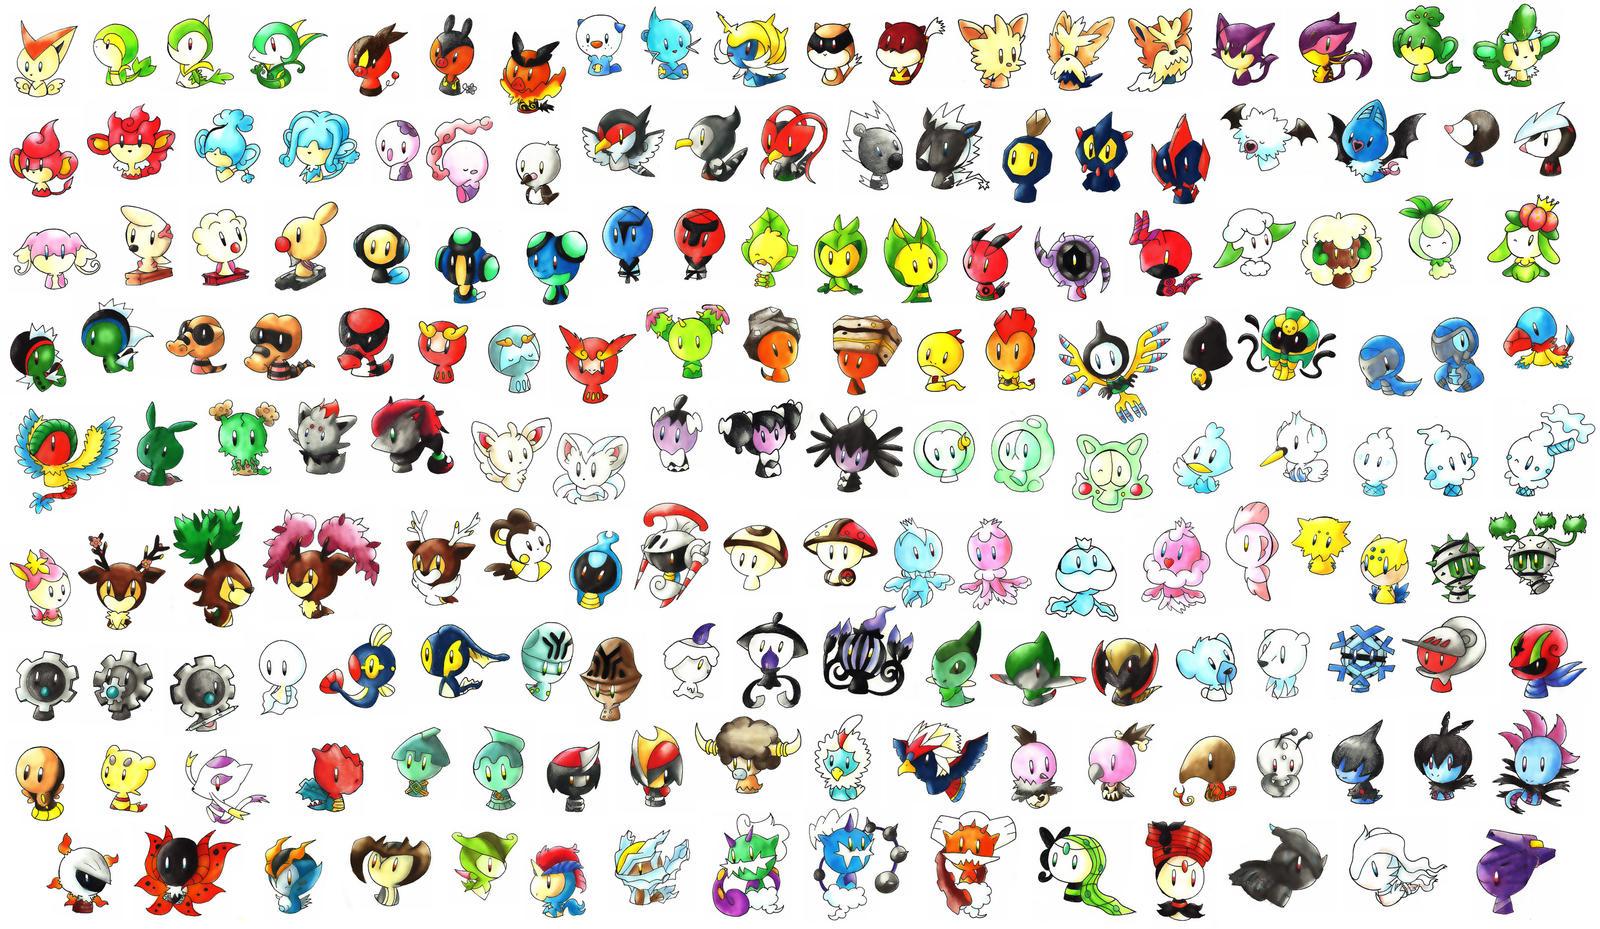 planned all along pokémon white part 1